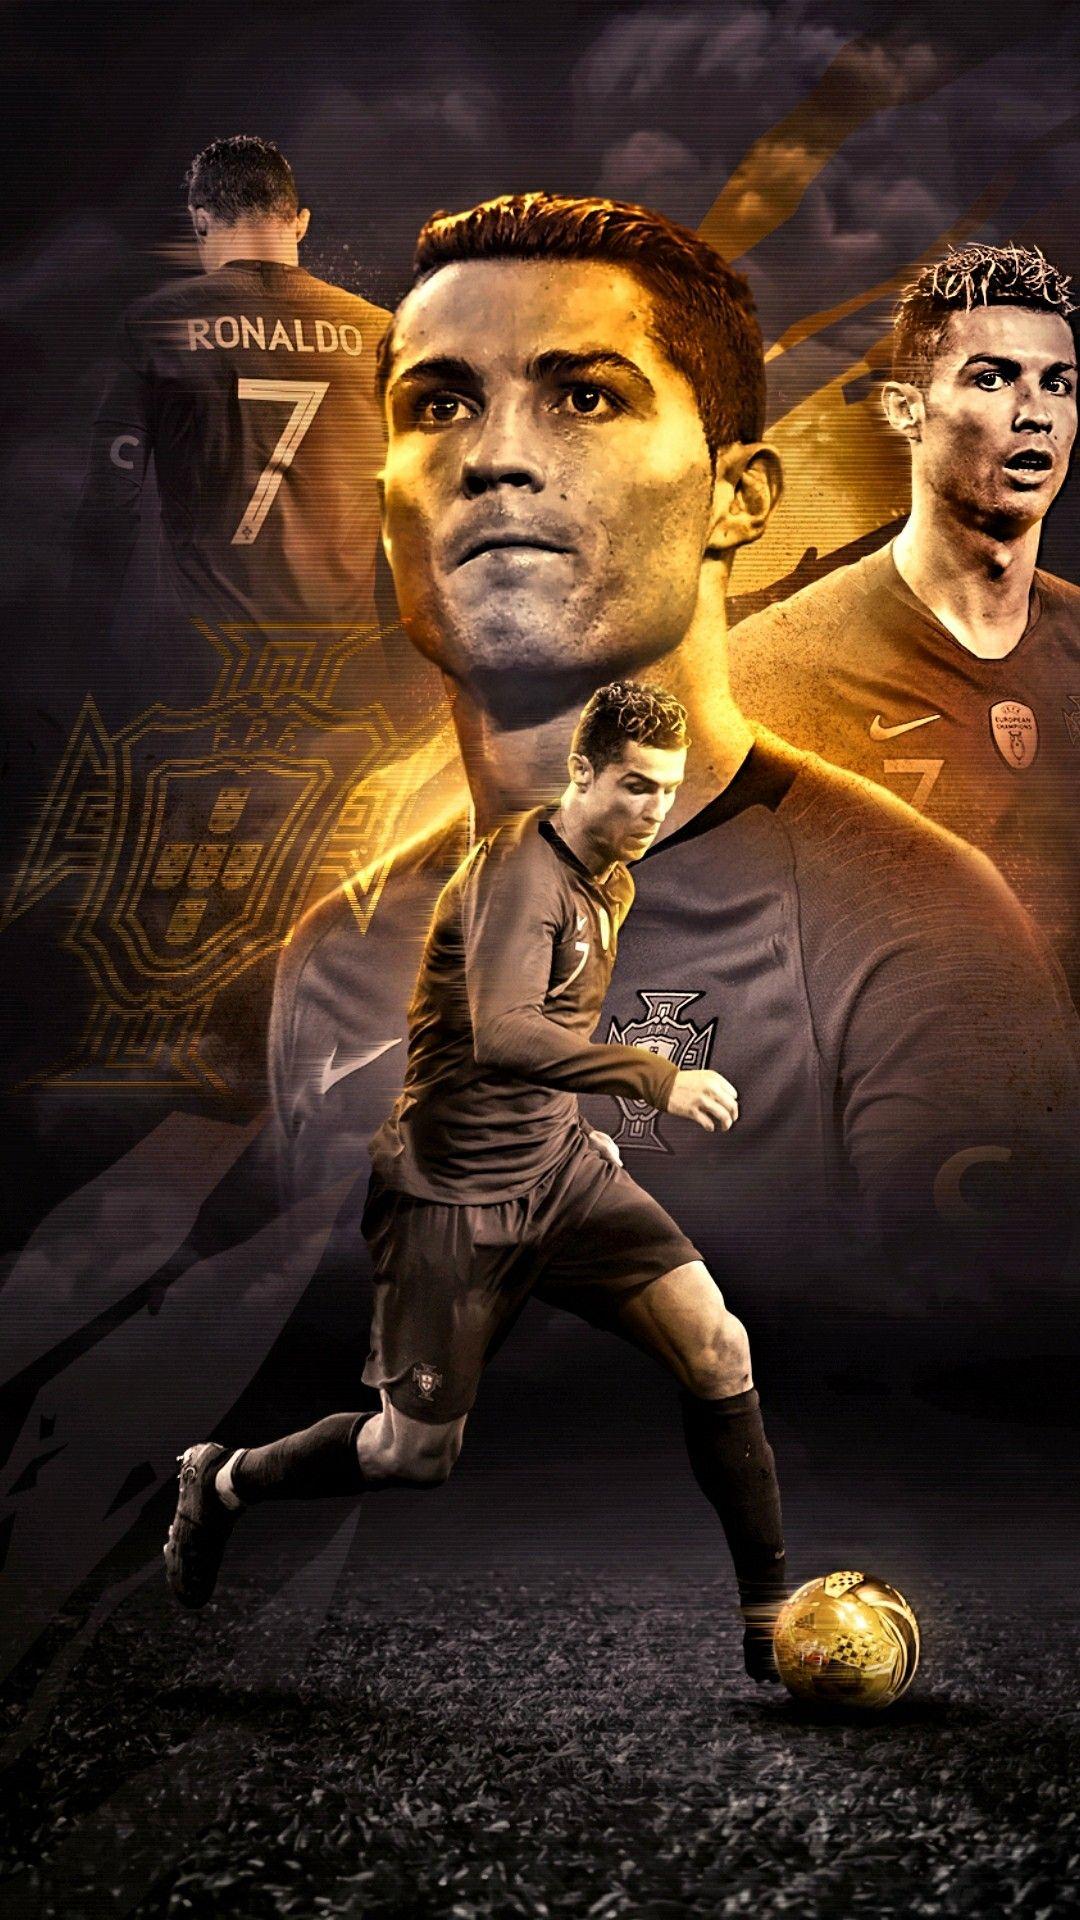 Ronaldo Португалия